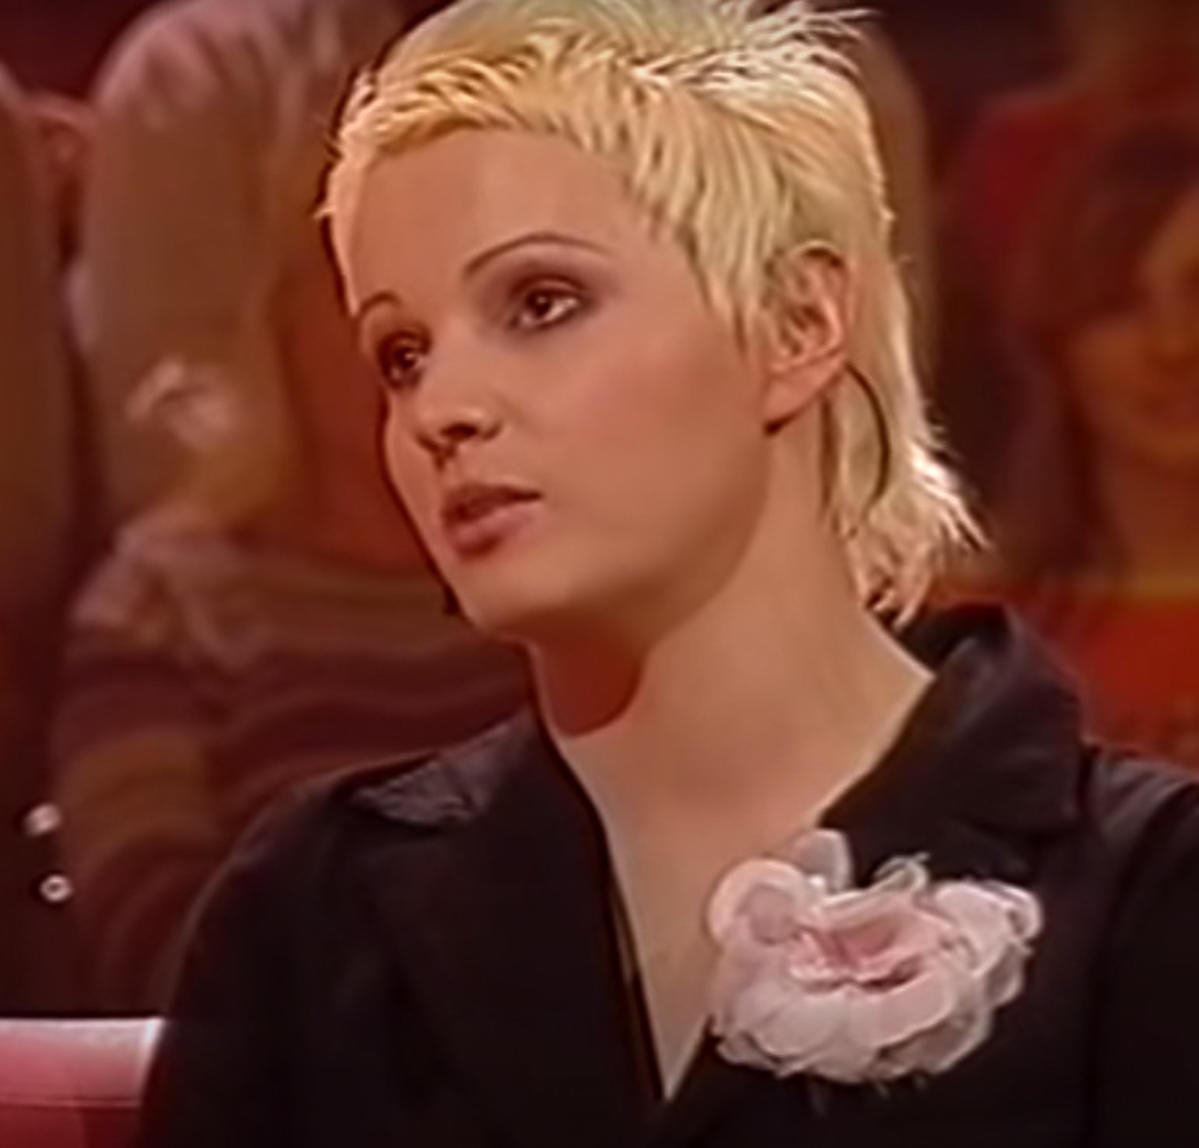 Dorota Szelągowska 16 lat temu w programie Moja krew